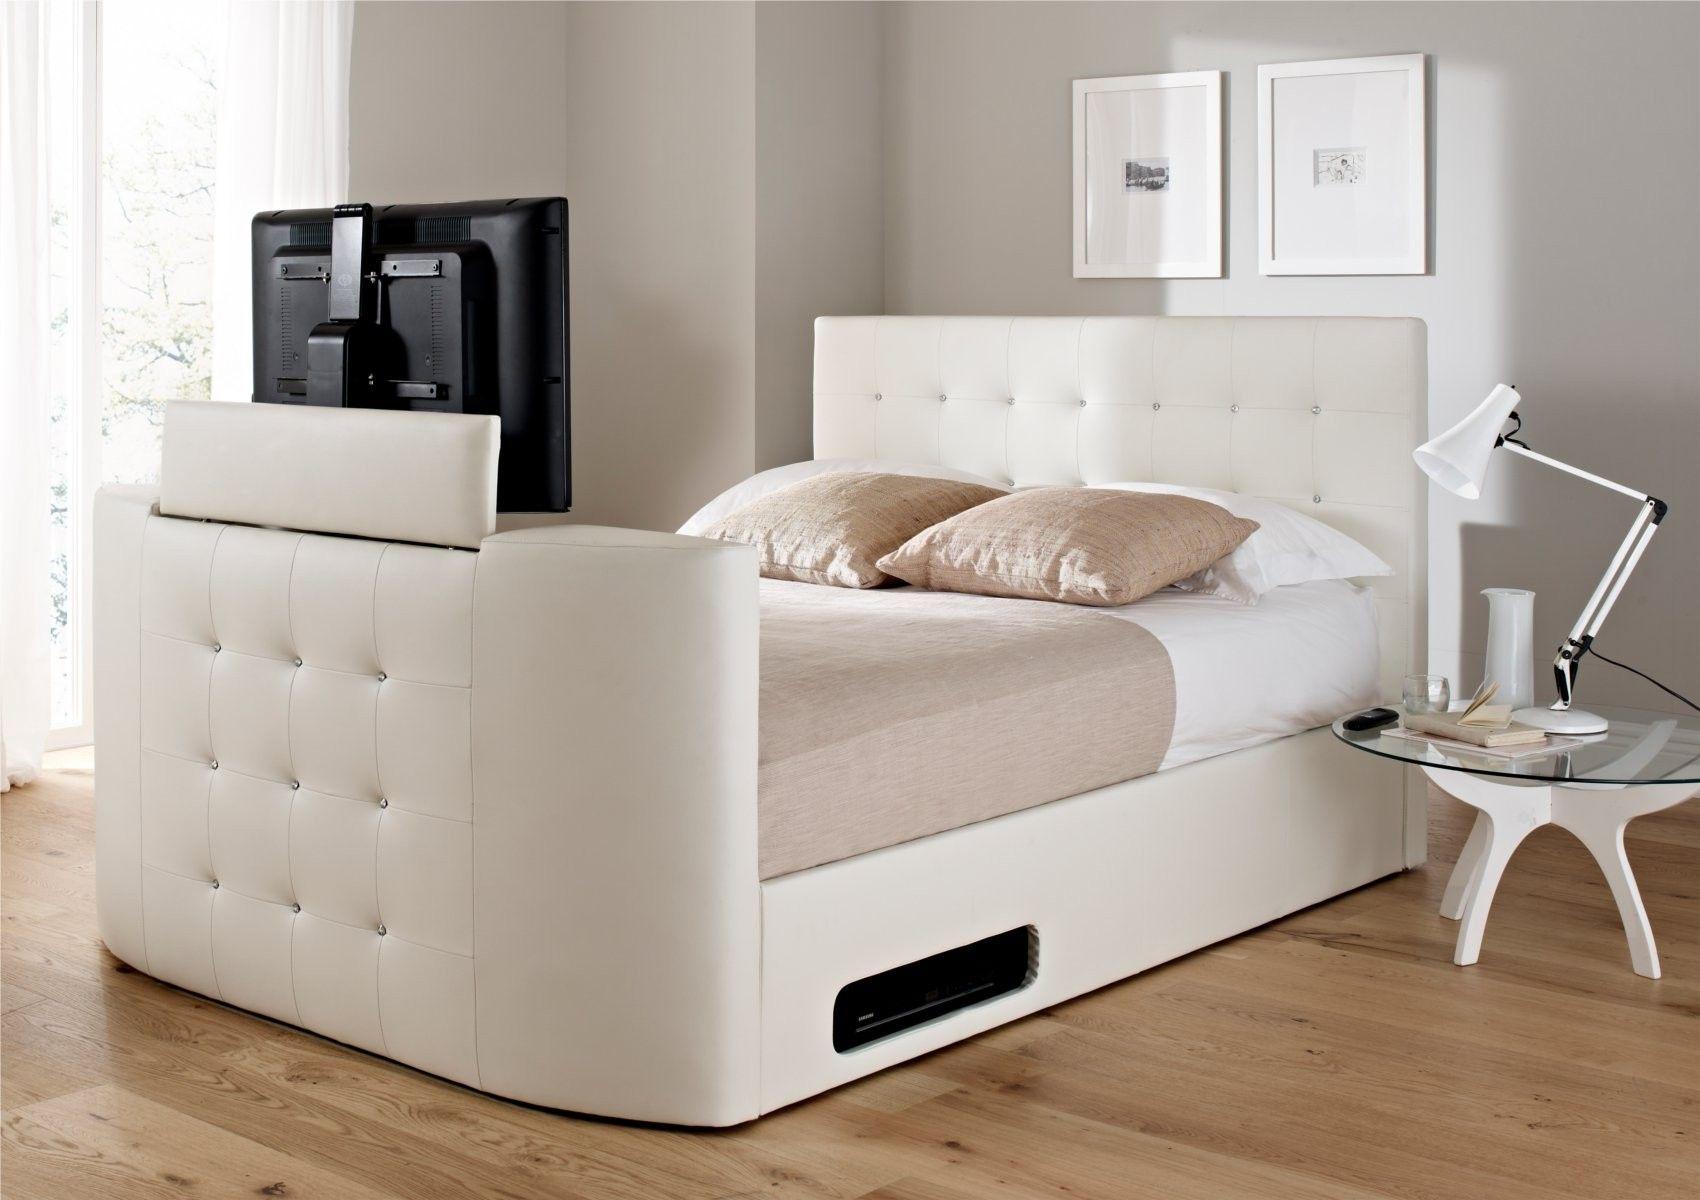 Wonderful Atlantis Leather Ottoman TV Bed   White   Ottoman Beds   Storage Beds   Beds